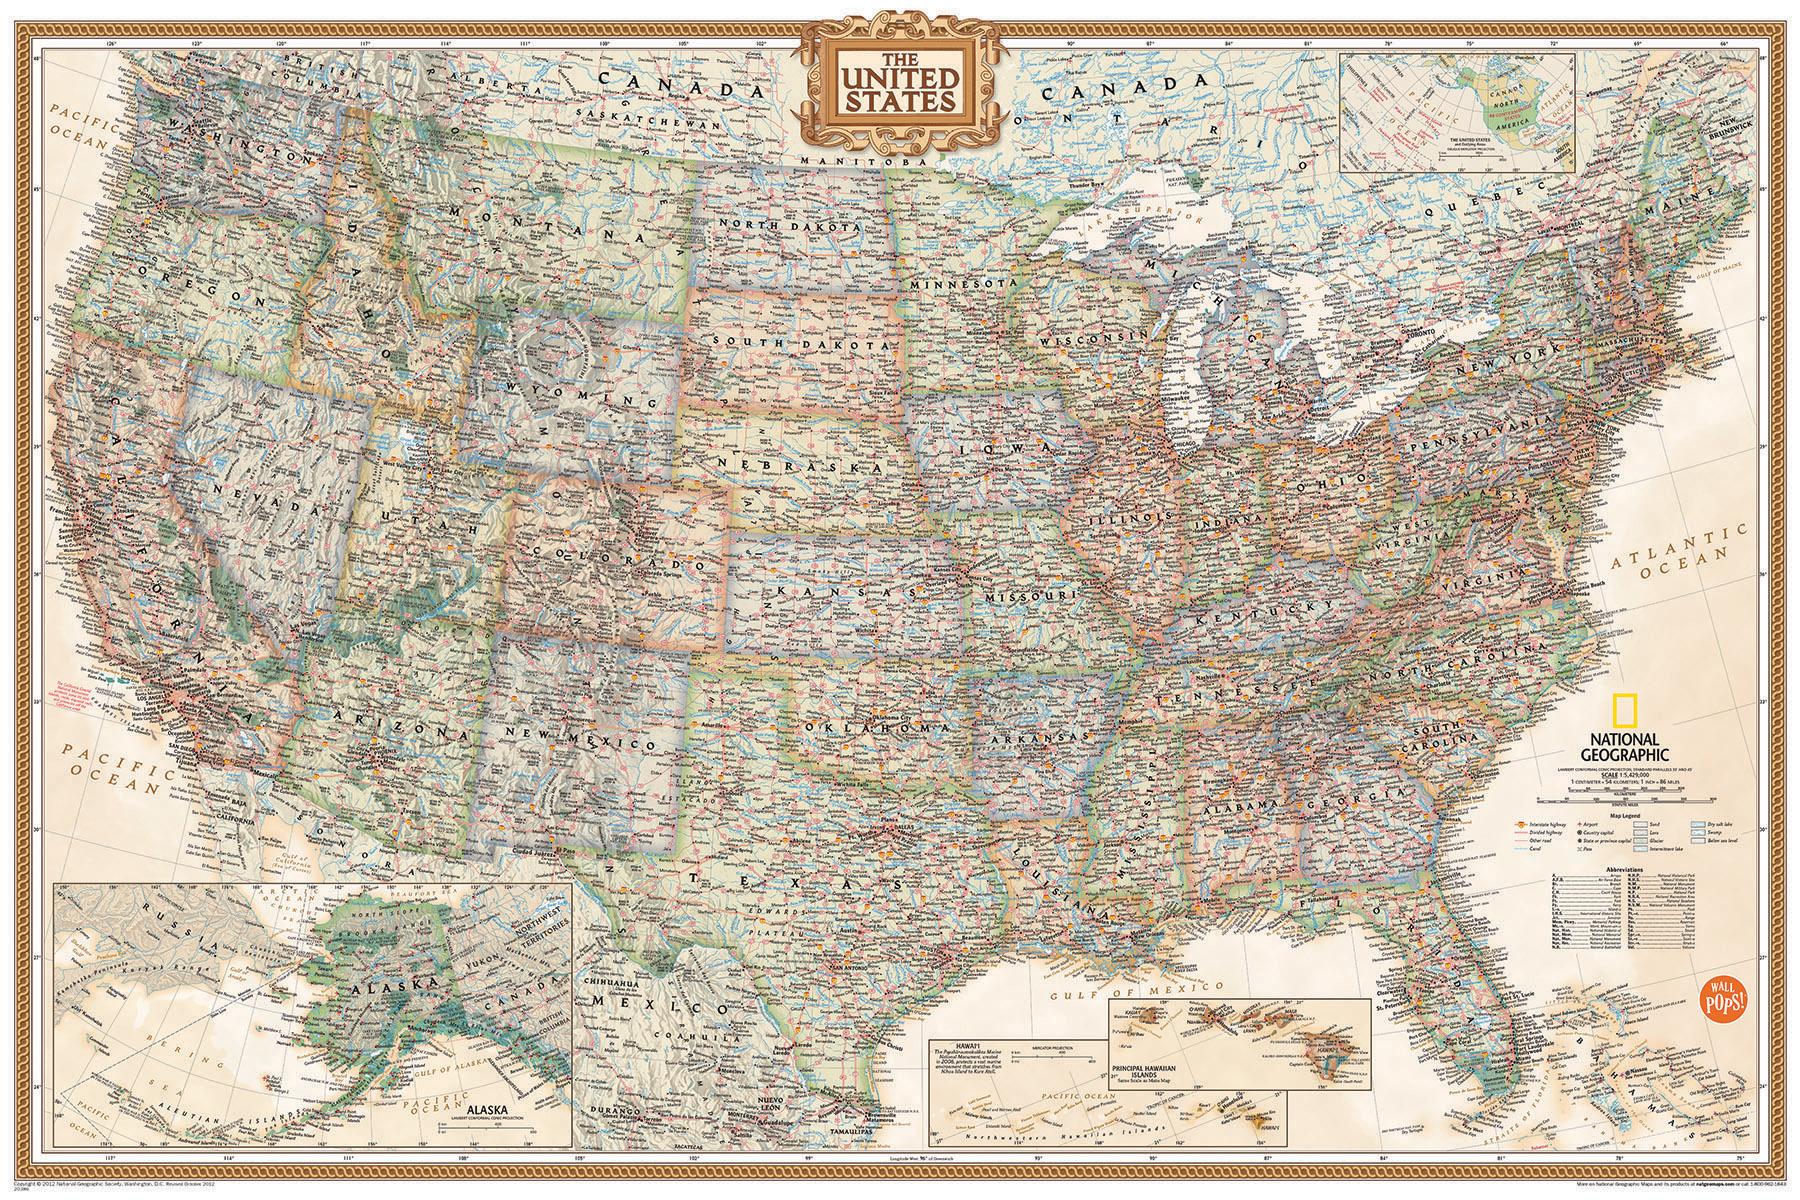 Executive Map of the USA